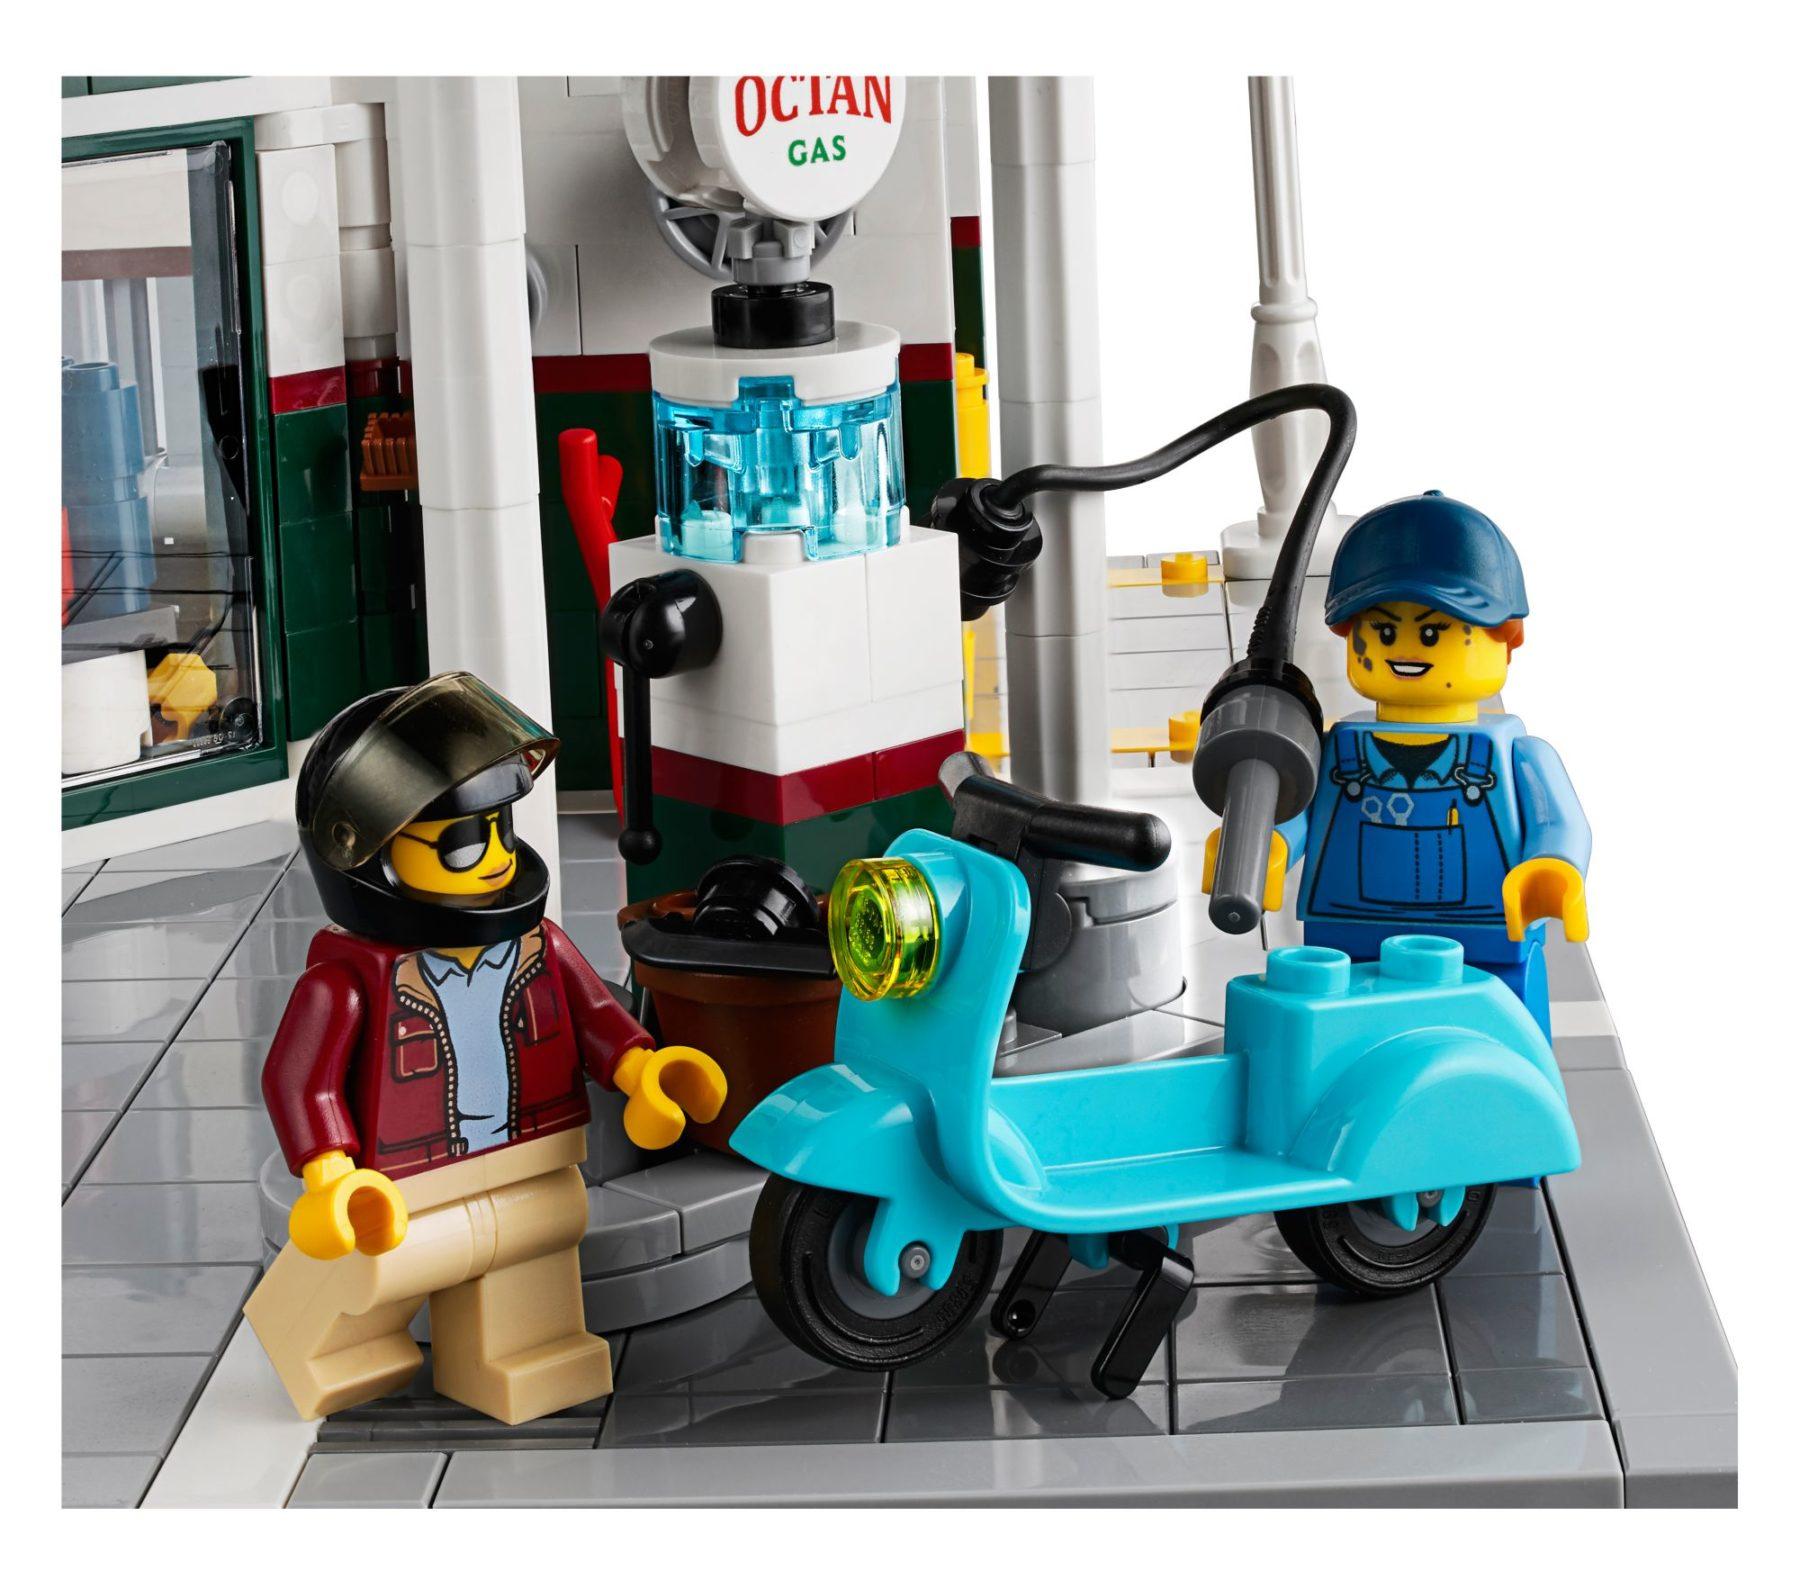 LEGO 10264 Eckgarage Modular Building: Tankstelle